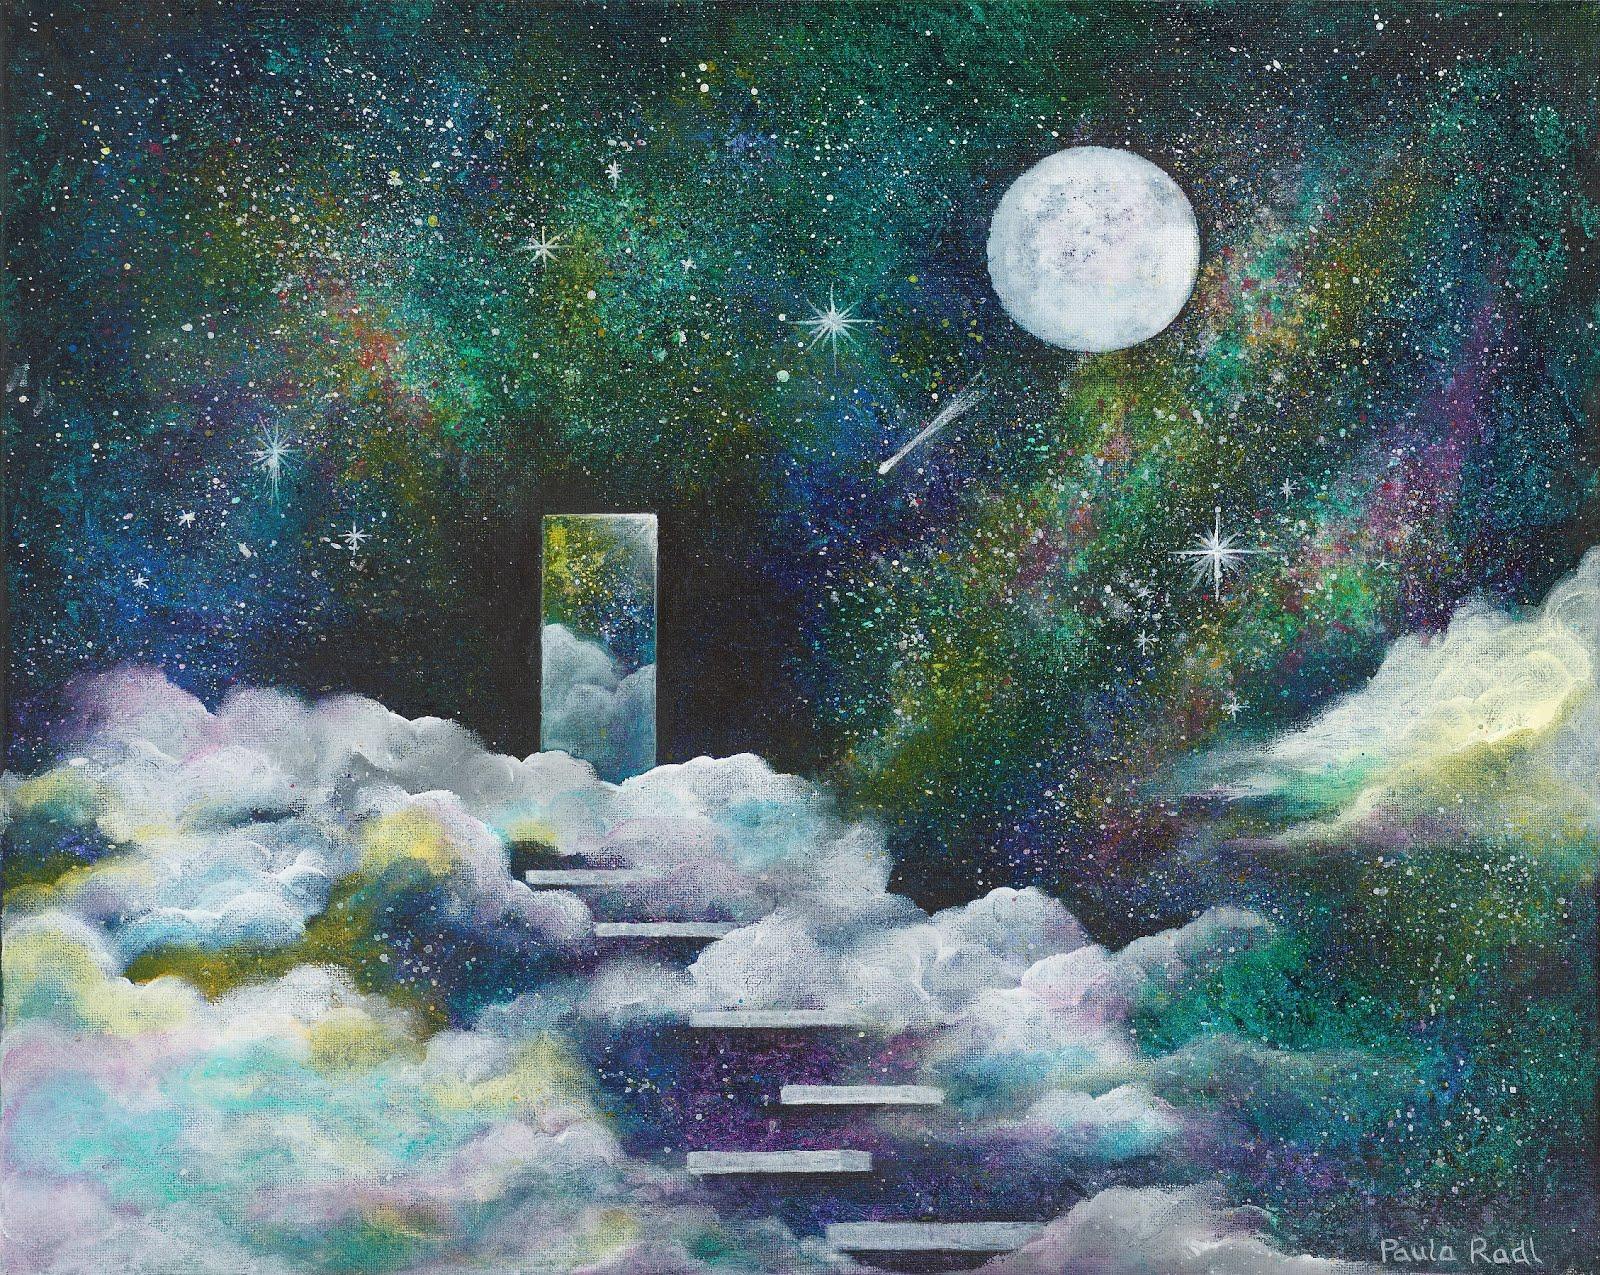 Paula Radl Prints and Paintings on Canvas for Sale- Inkdrop Gallery